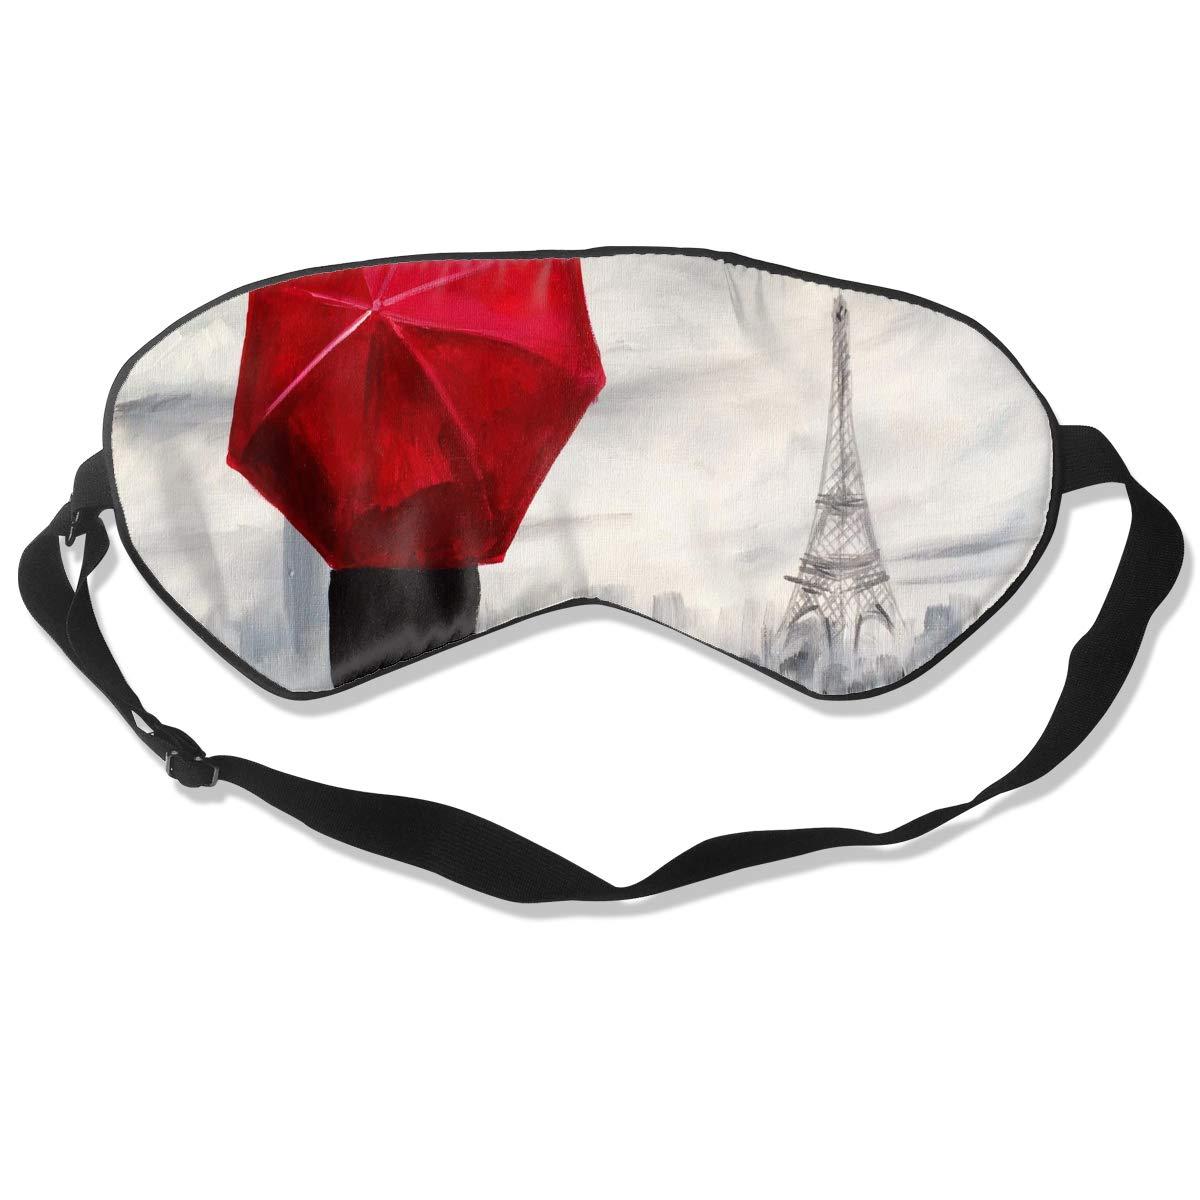 bf5d6a804e82 Amazon.com: Sleep Mask Art Rave-Raindrops in Paris Eye Mask Patch ...